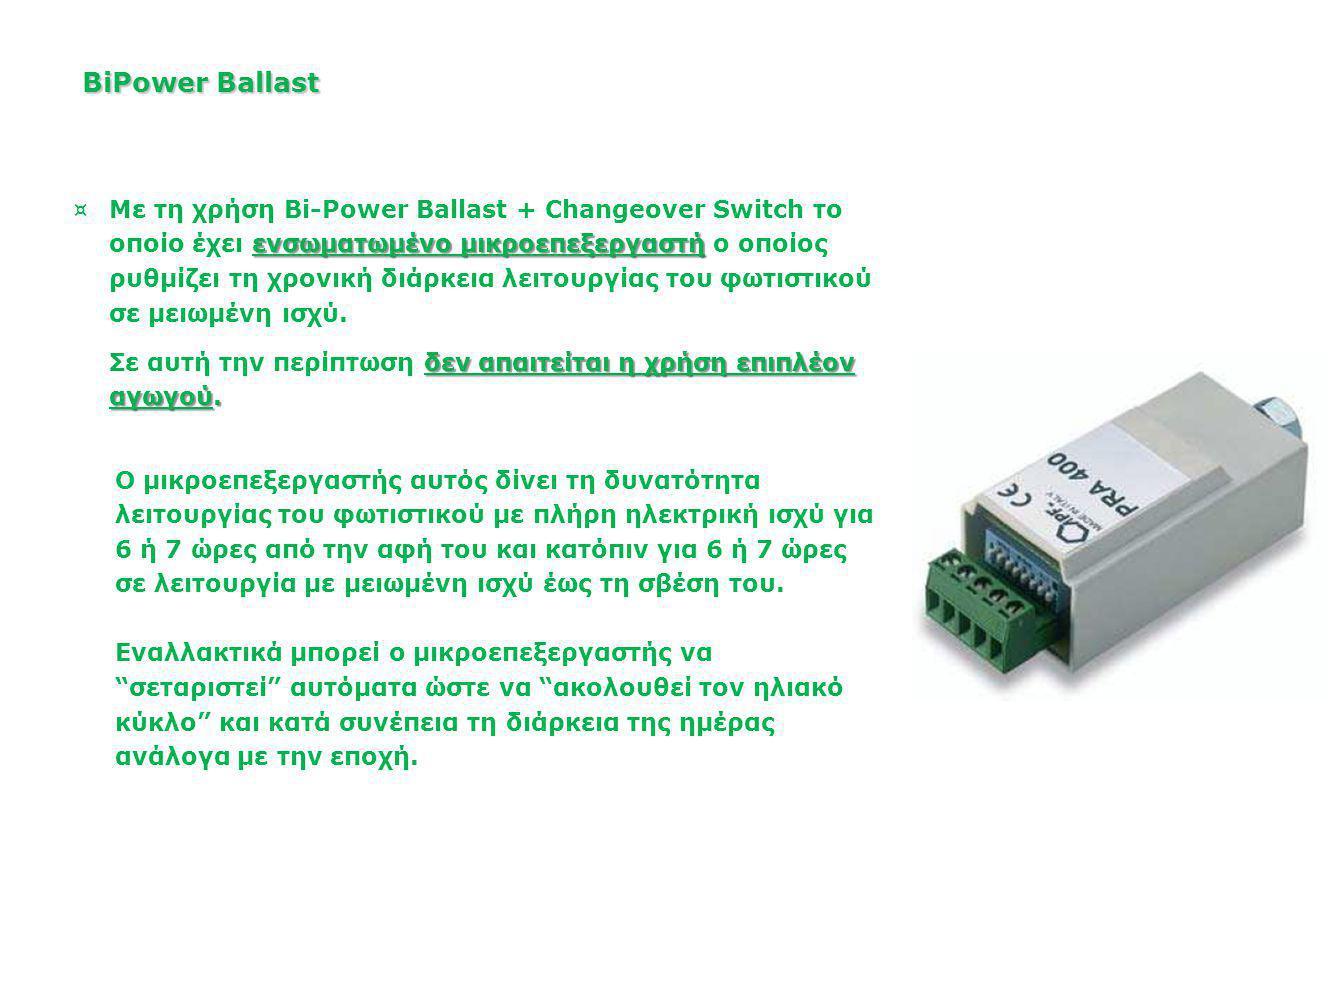 Changeover Switch BiPower Ballast Πυκνωτής BiPower Ballast Εκκινητής